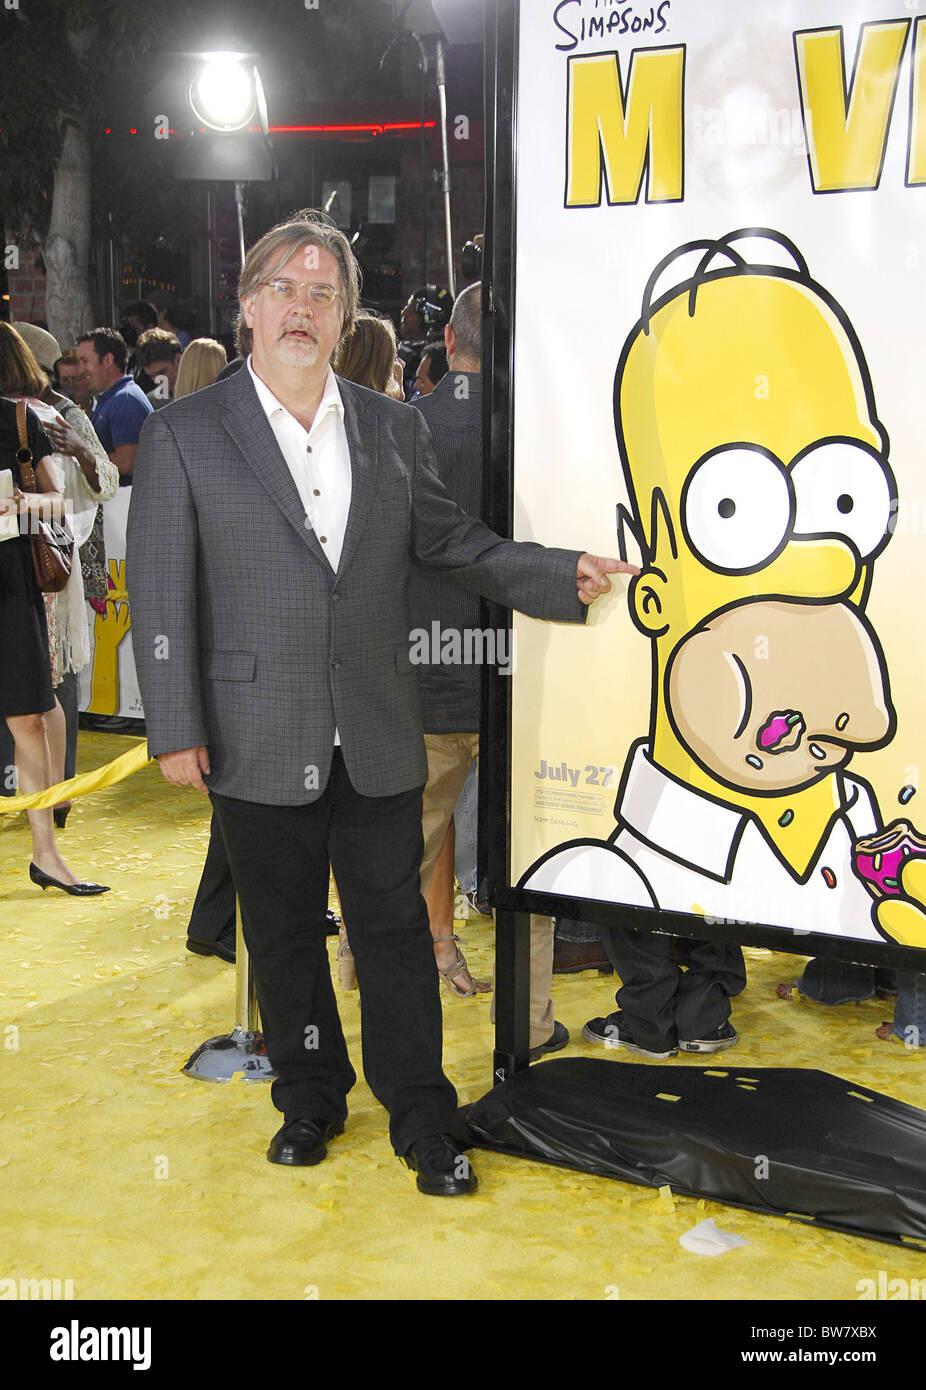 The Simpson S Movie Premiere Stock Photo Alamy